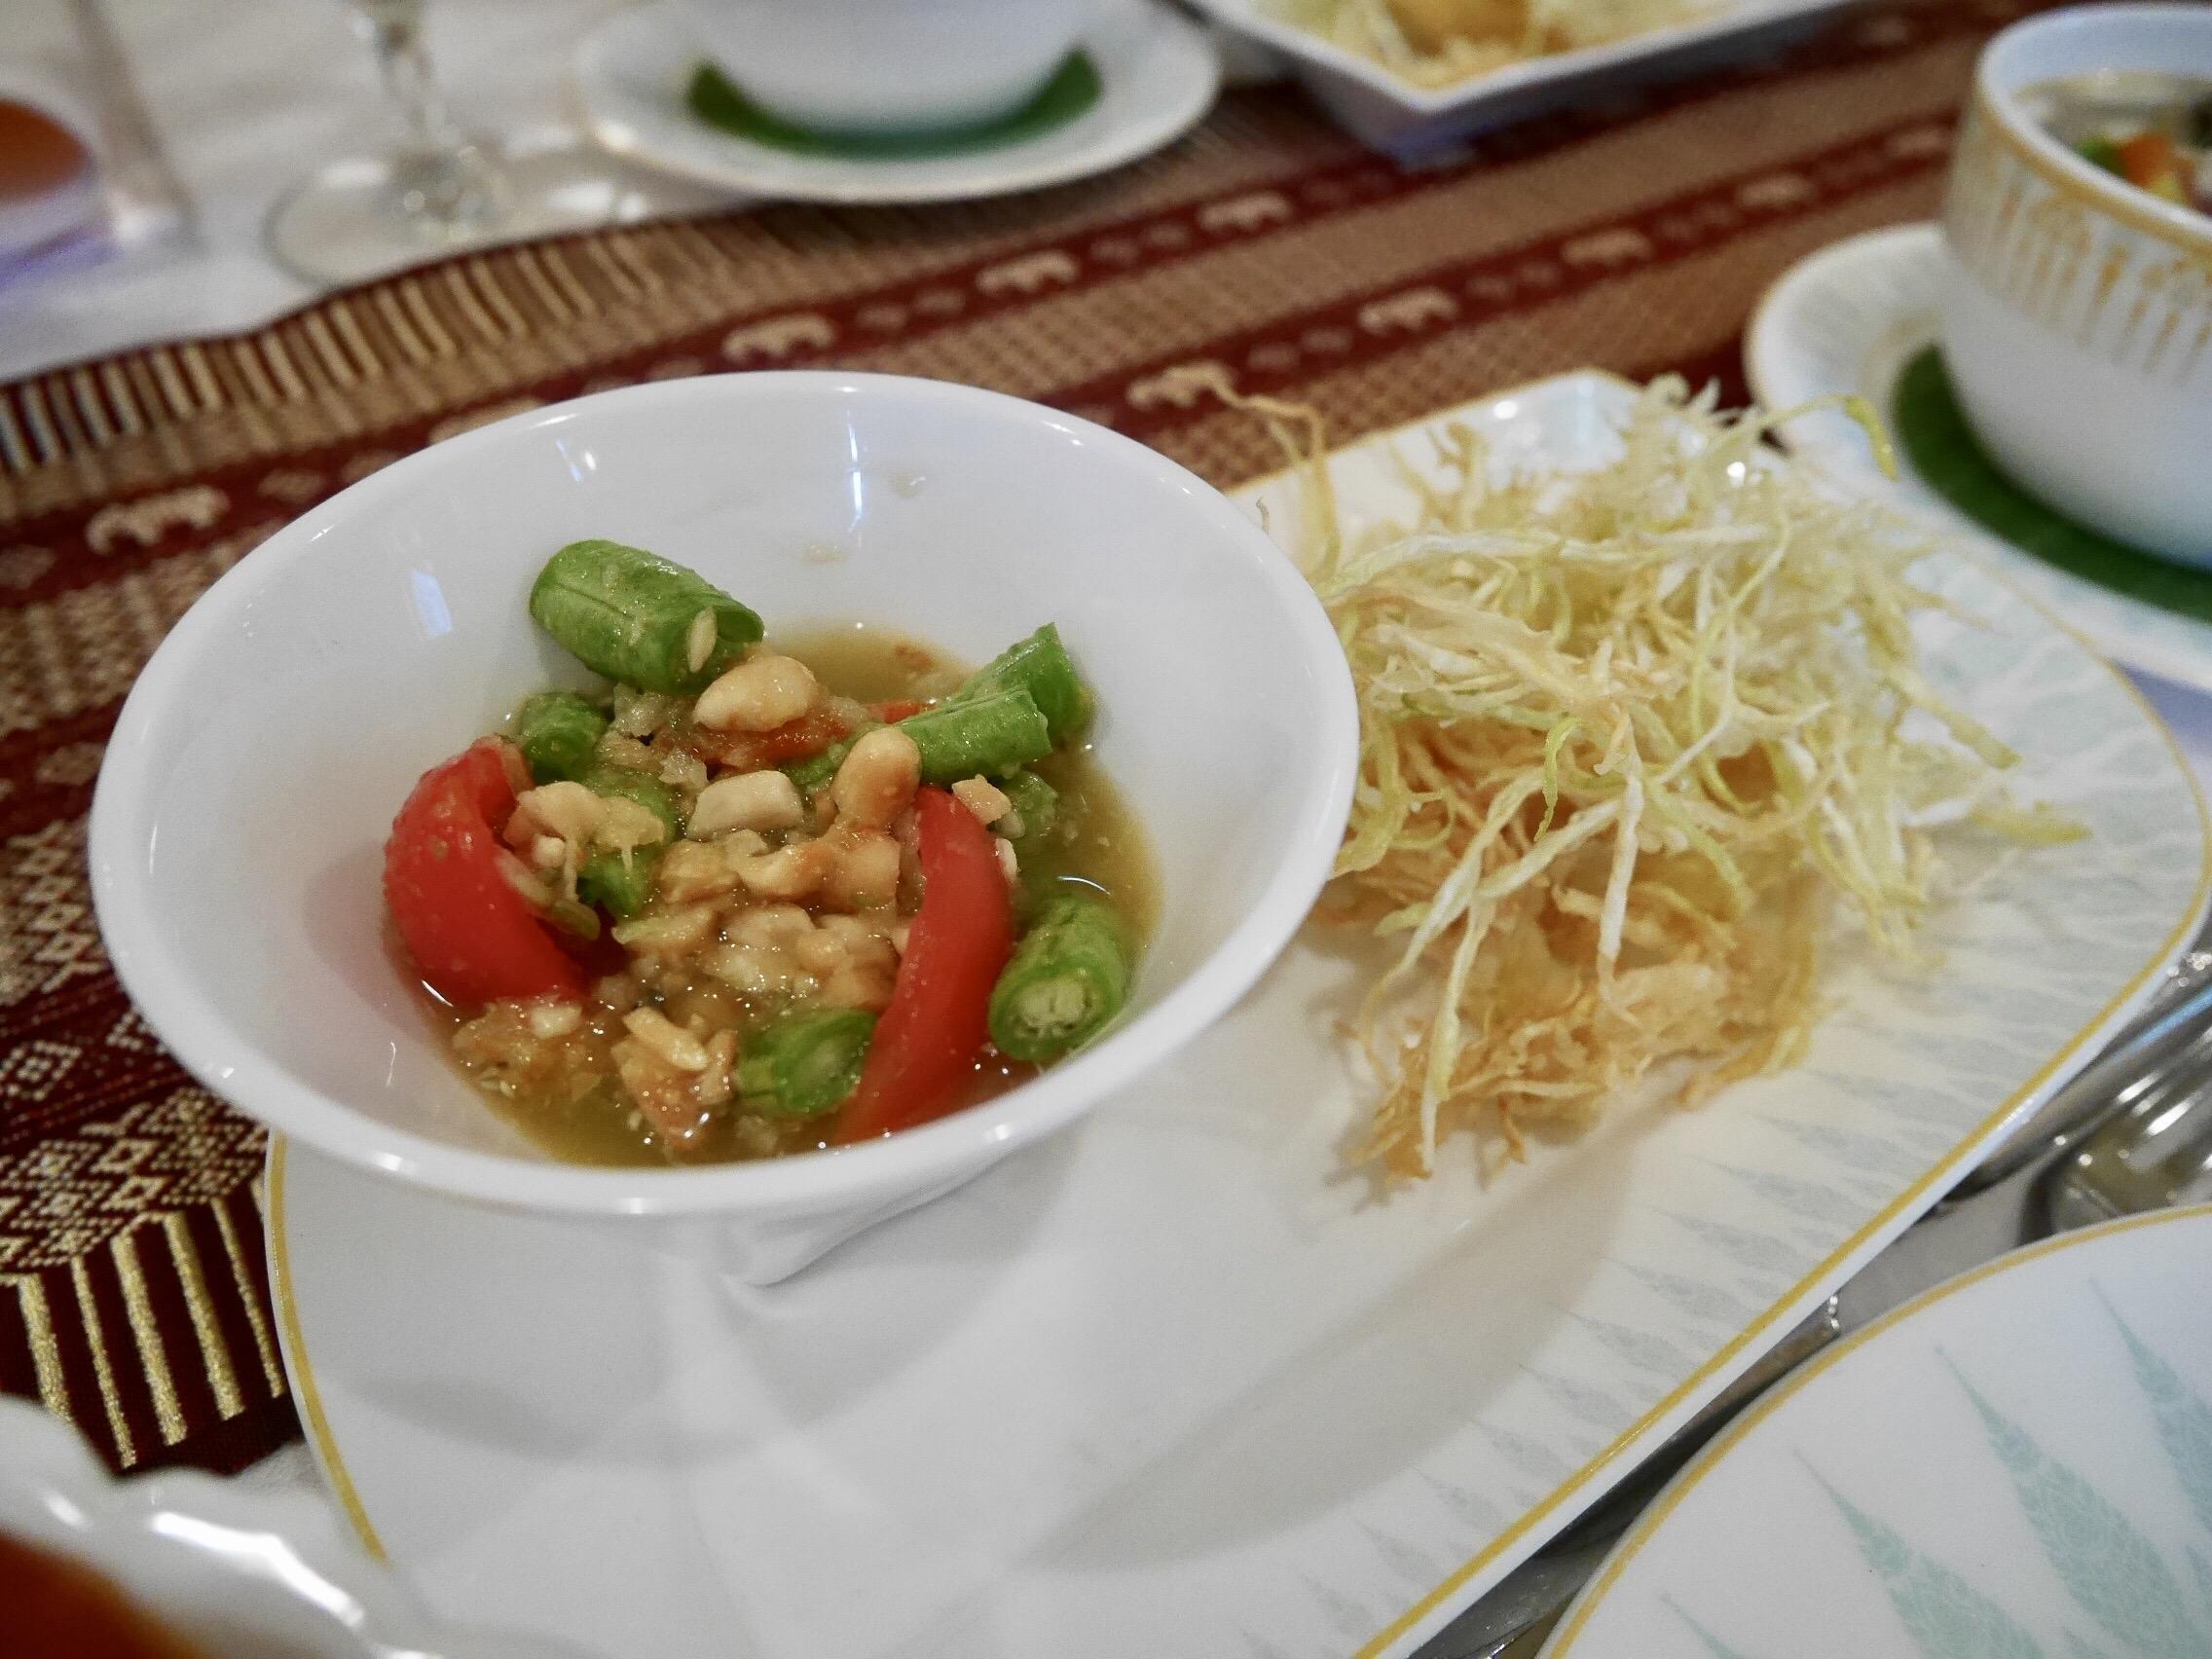 img 9043 1 - The Oriental Thai Cooking School - マンダリンオリエンタルバンコクのおもてなし空間で体験する絶品タイ料理教室